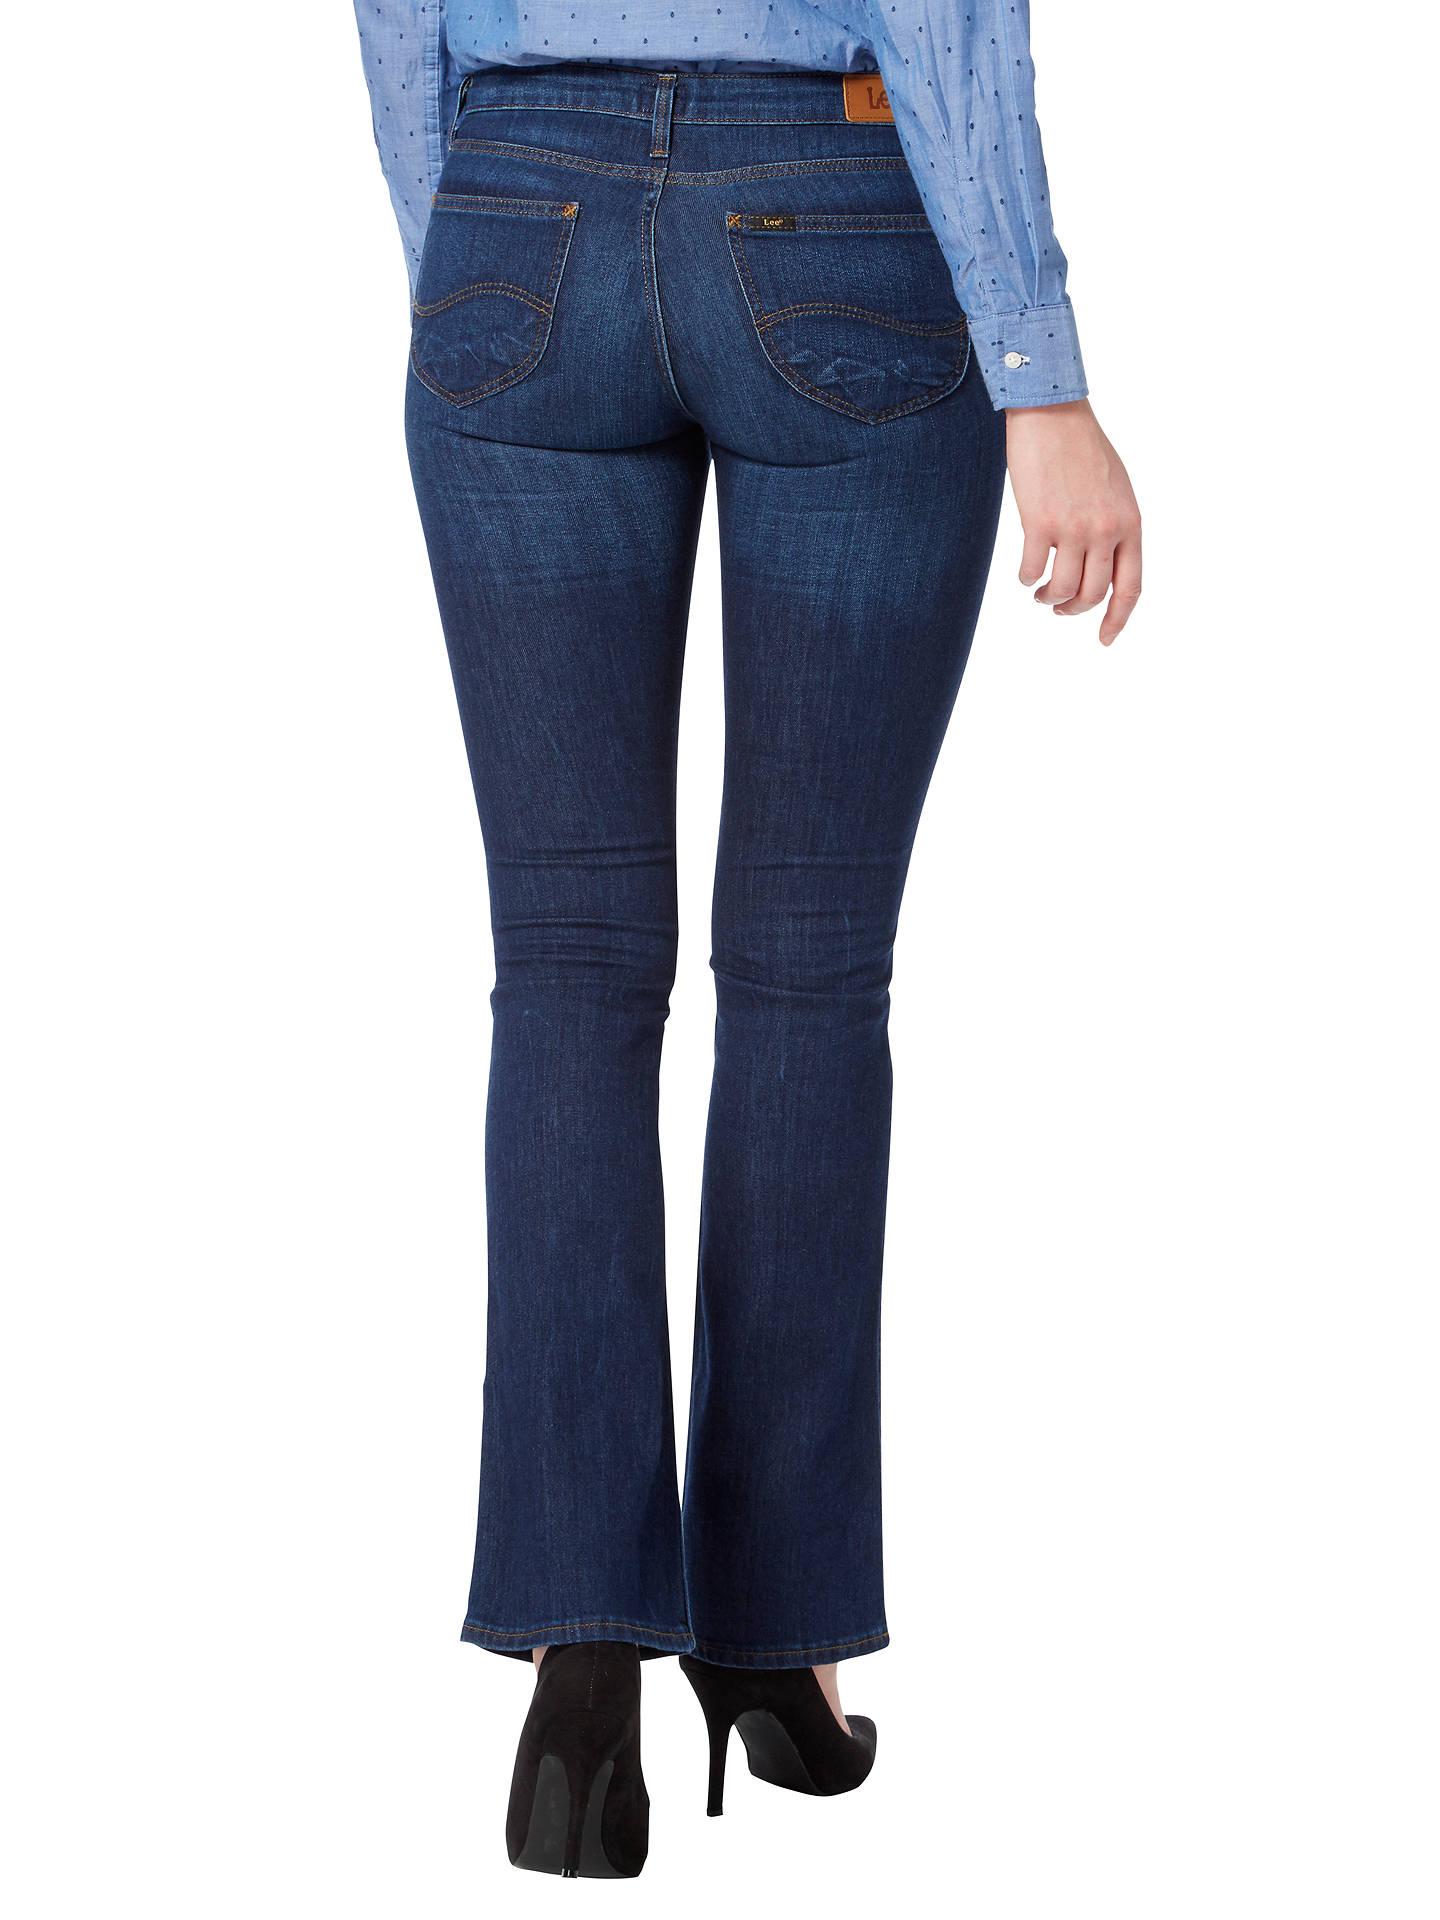 595ae138a99 ... Buy Lee Hoxie Skinny Bootcut Jeans, Heritage Blue, W28/L31 Online at  johnlewis ...